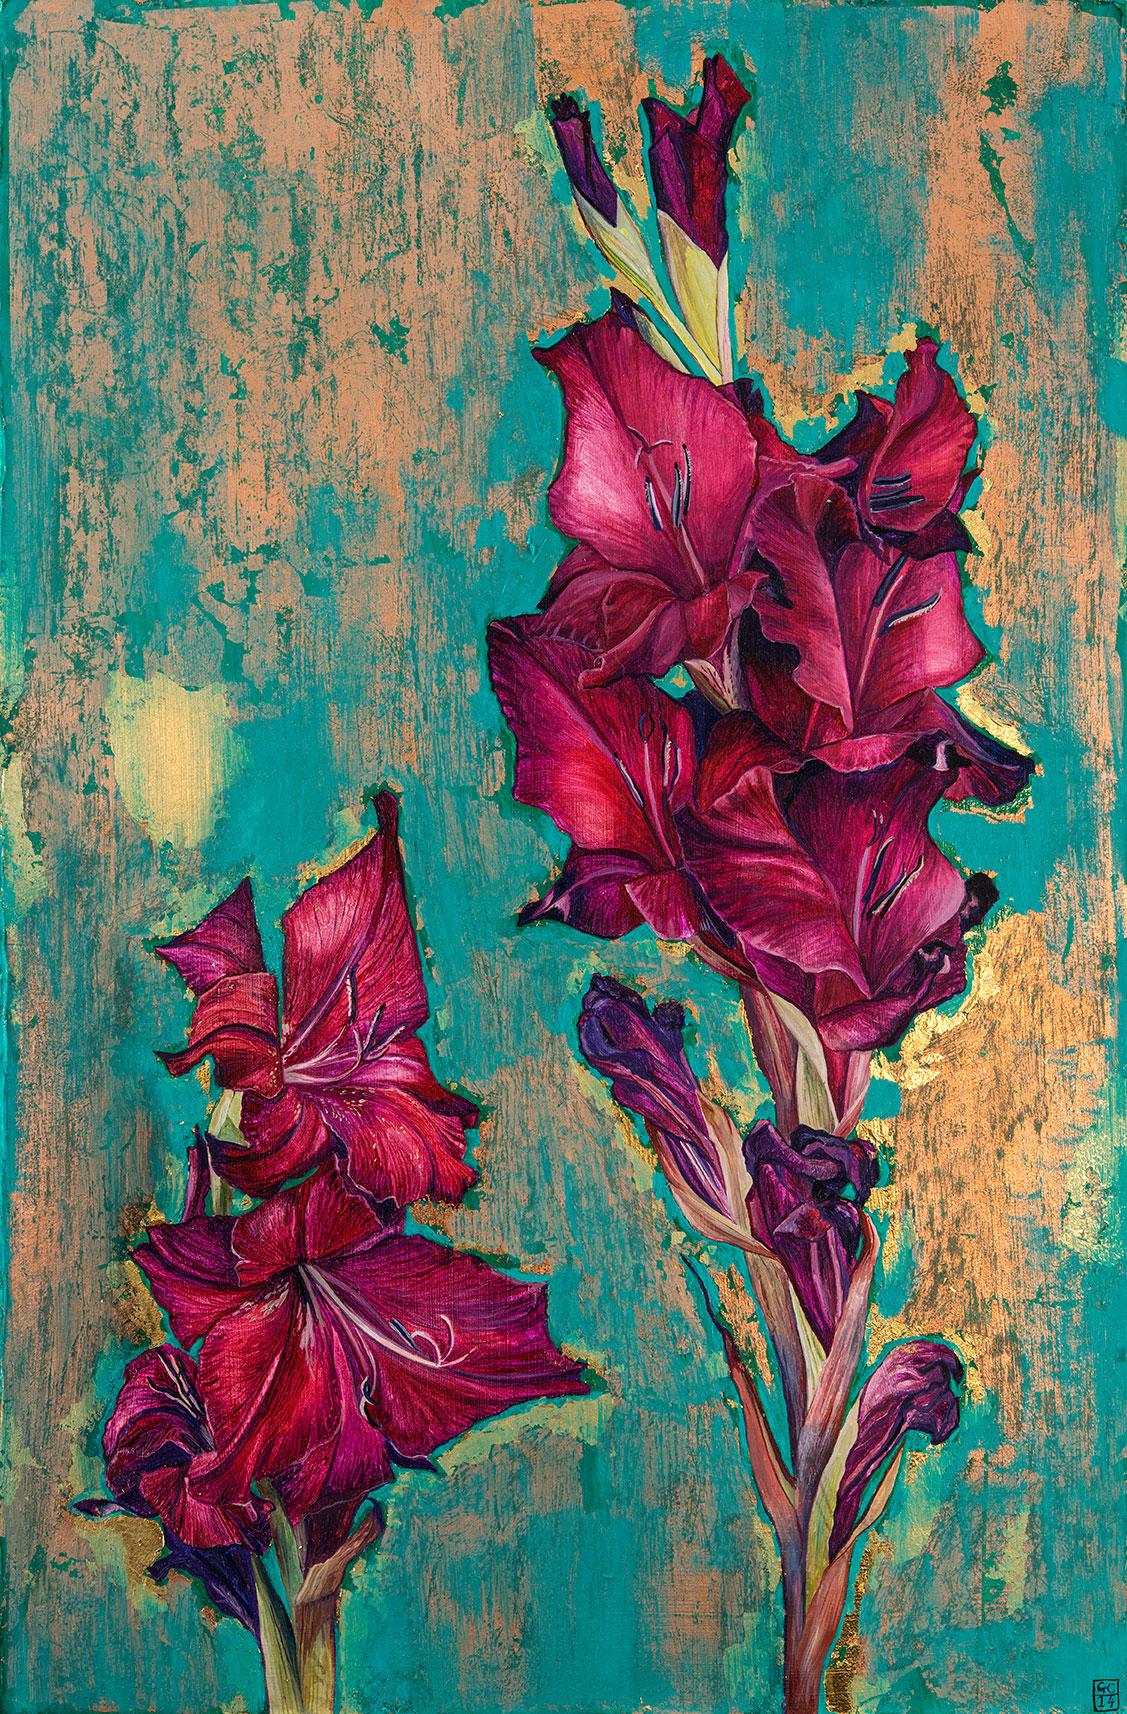 'Gladioli', Oil and Metal Leaf on Card, 37.5cm x 25cm, 2015. SOLD